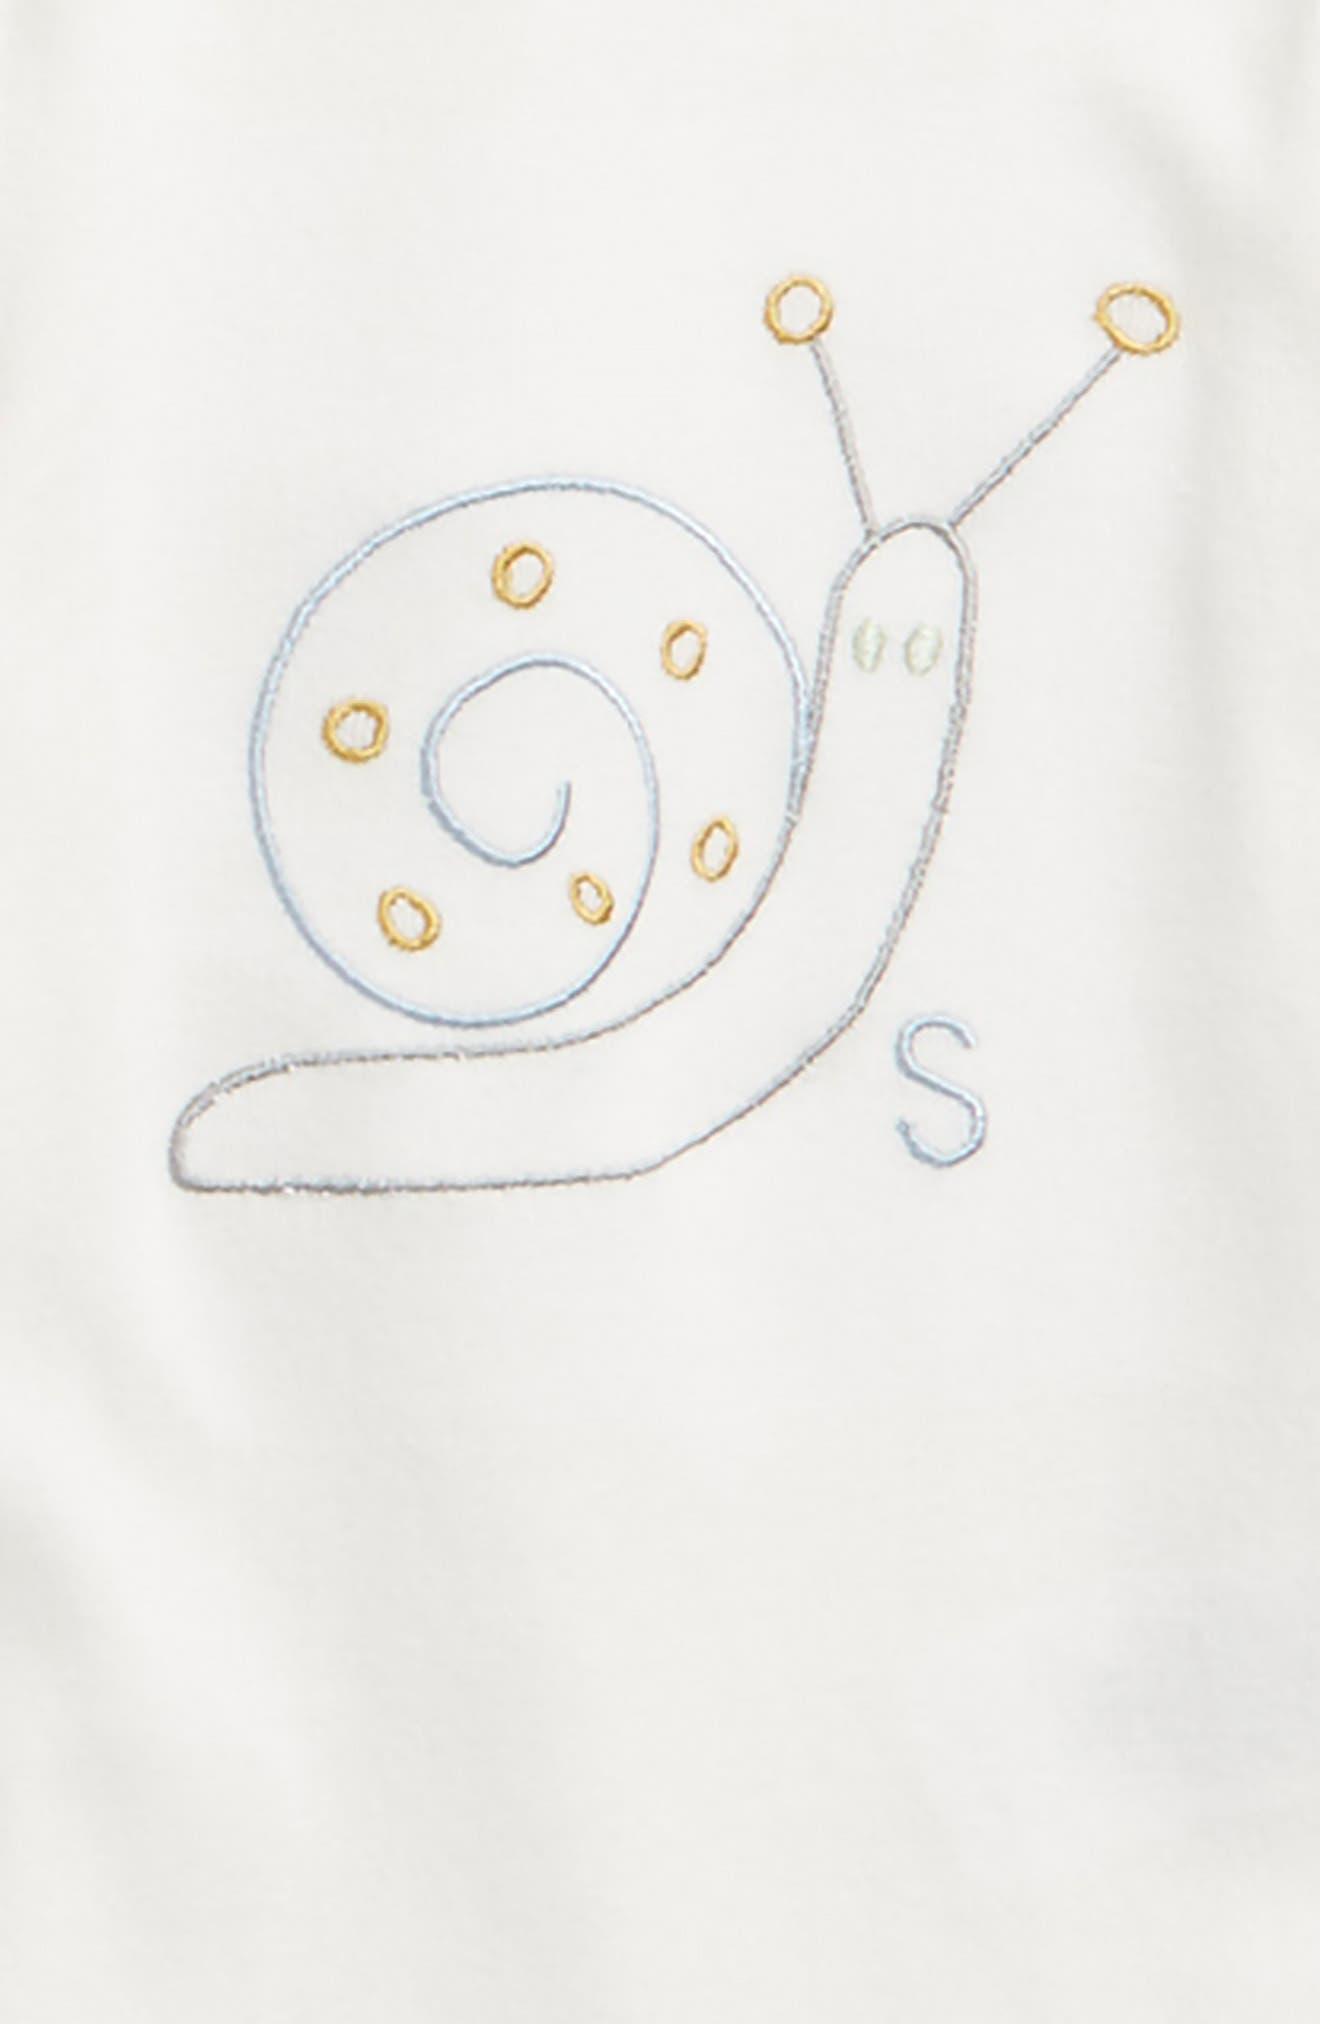 STELLA MCCARTNEY KIDS,                             Stella McCartney Sammie 7-Piece Day of the Week Cotton Bodysuit Gift Set,                             Alternate thumbnail 2, color,                             900